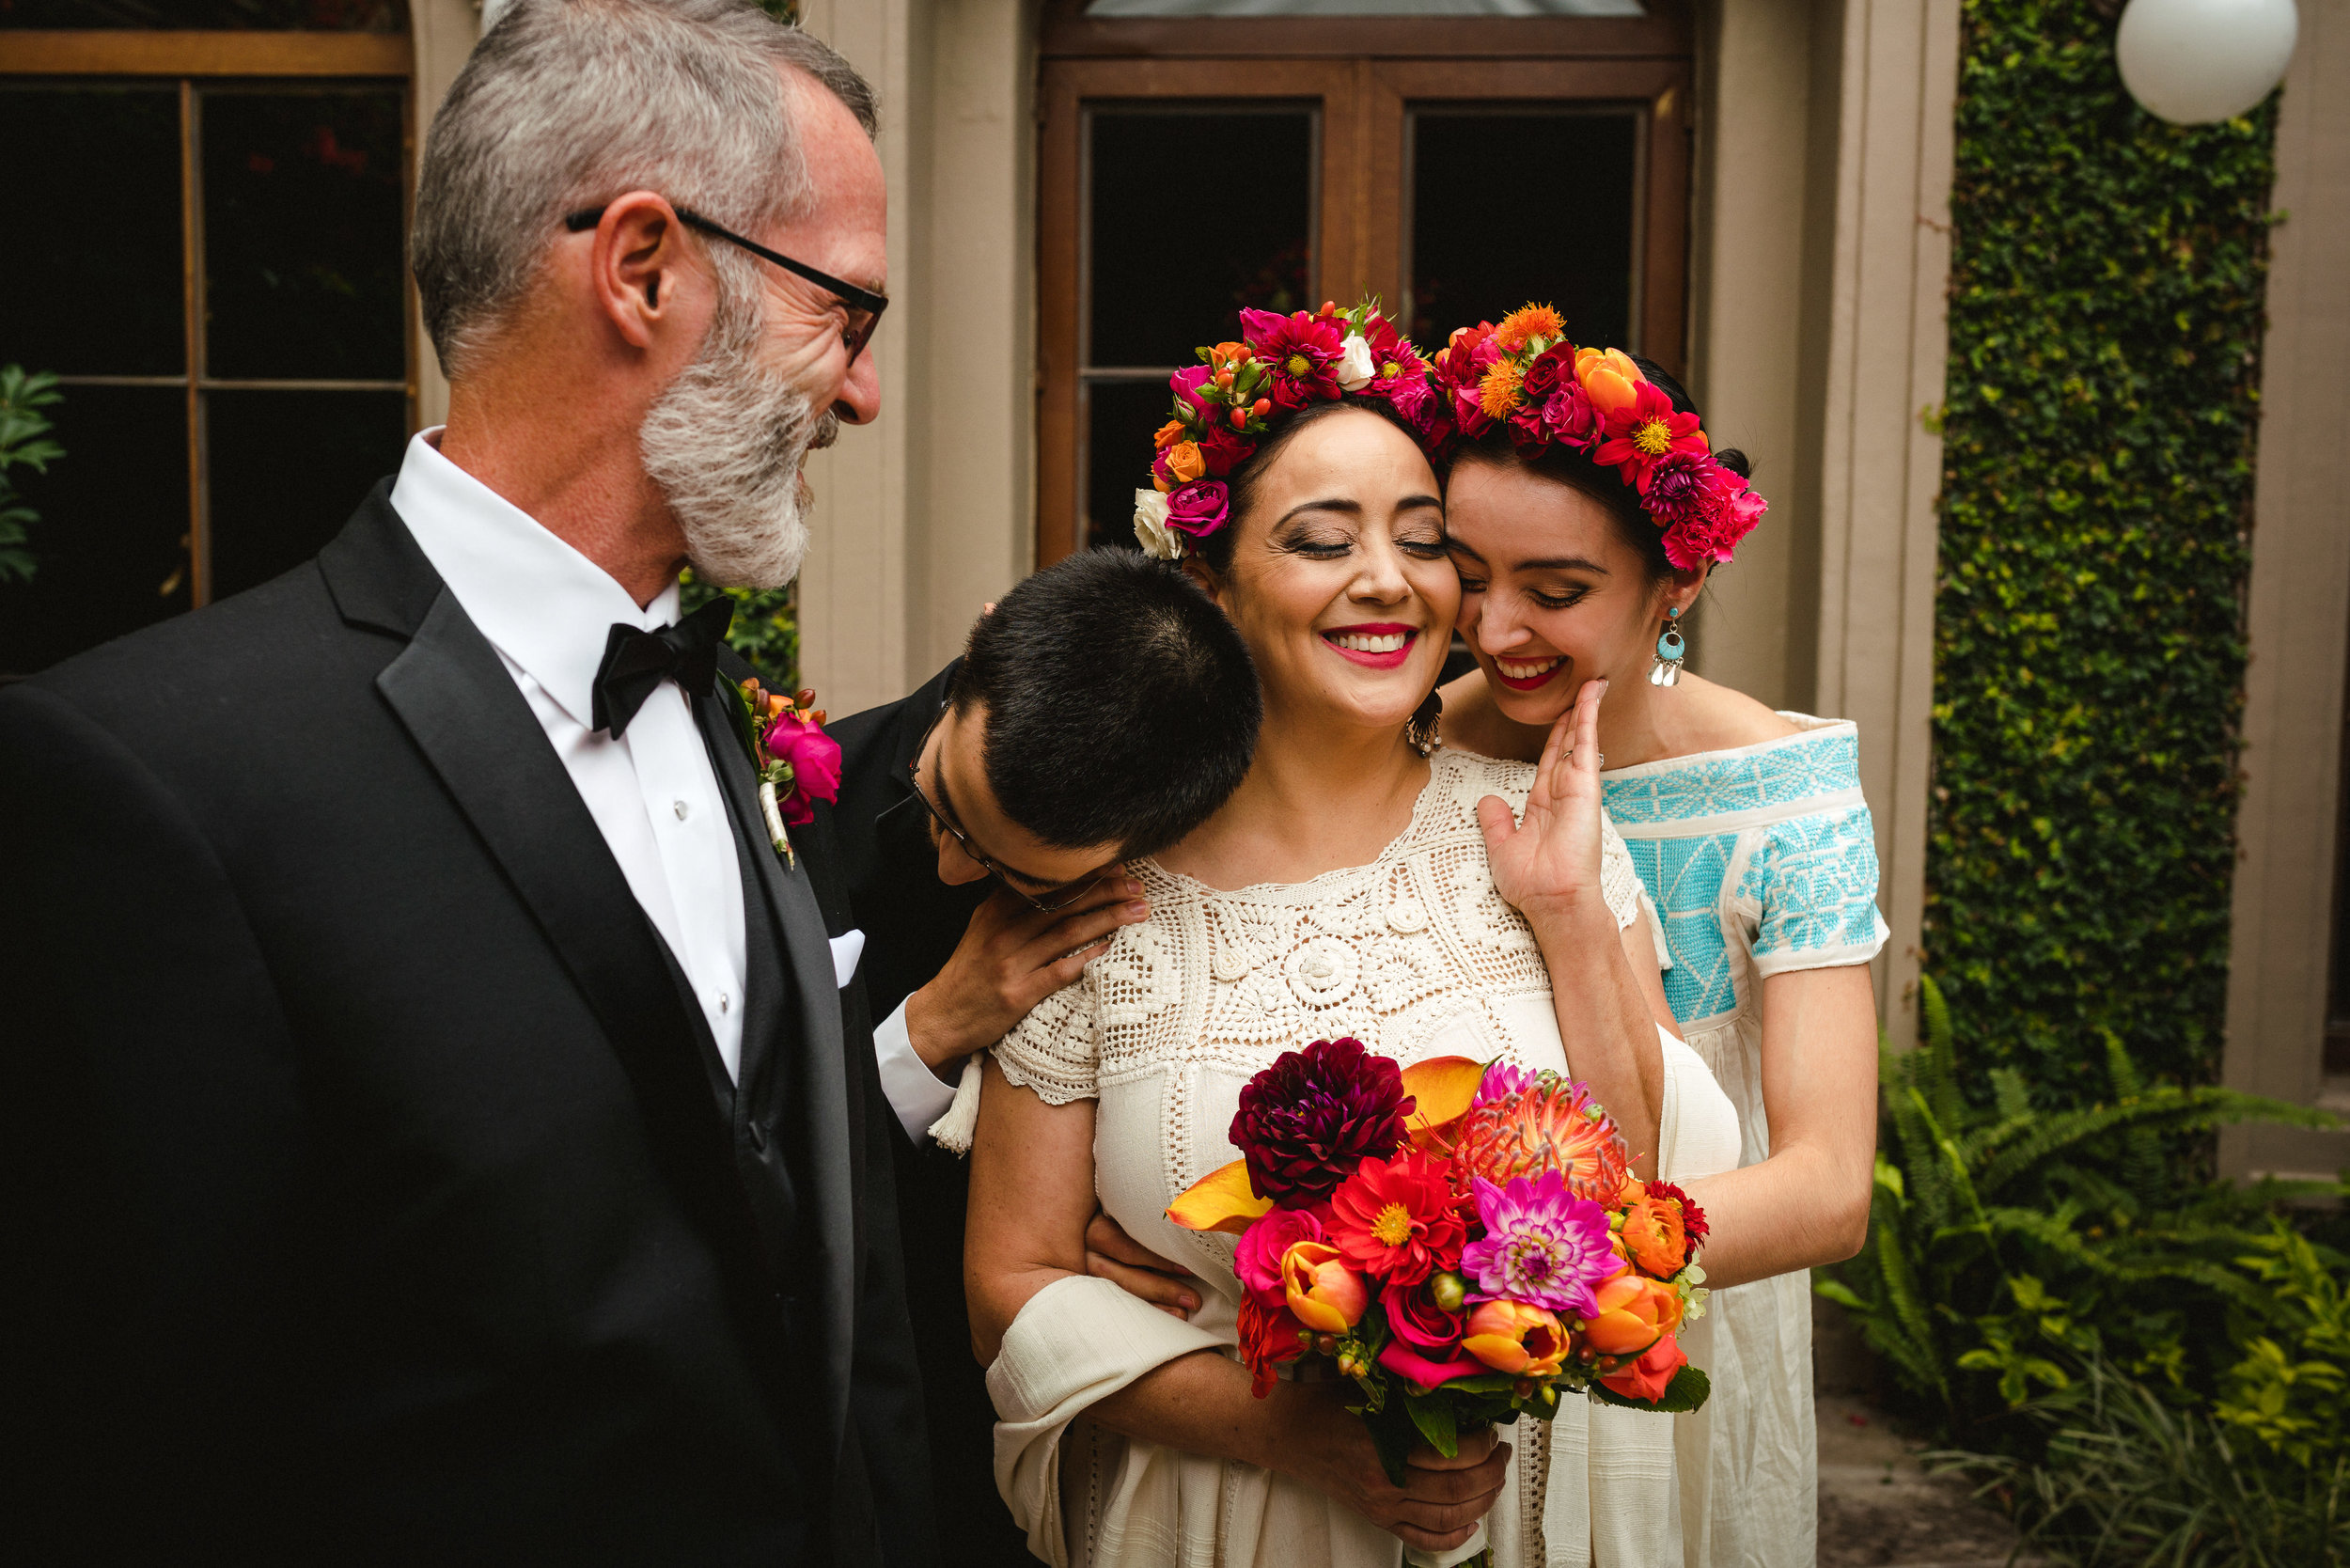 MaurizioSolisBroca-casa-carino-san-miguel-de-allende-wedding-40.jpg